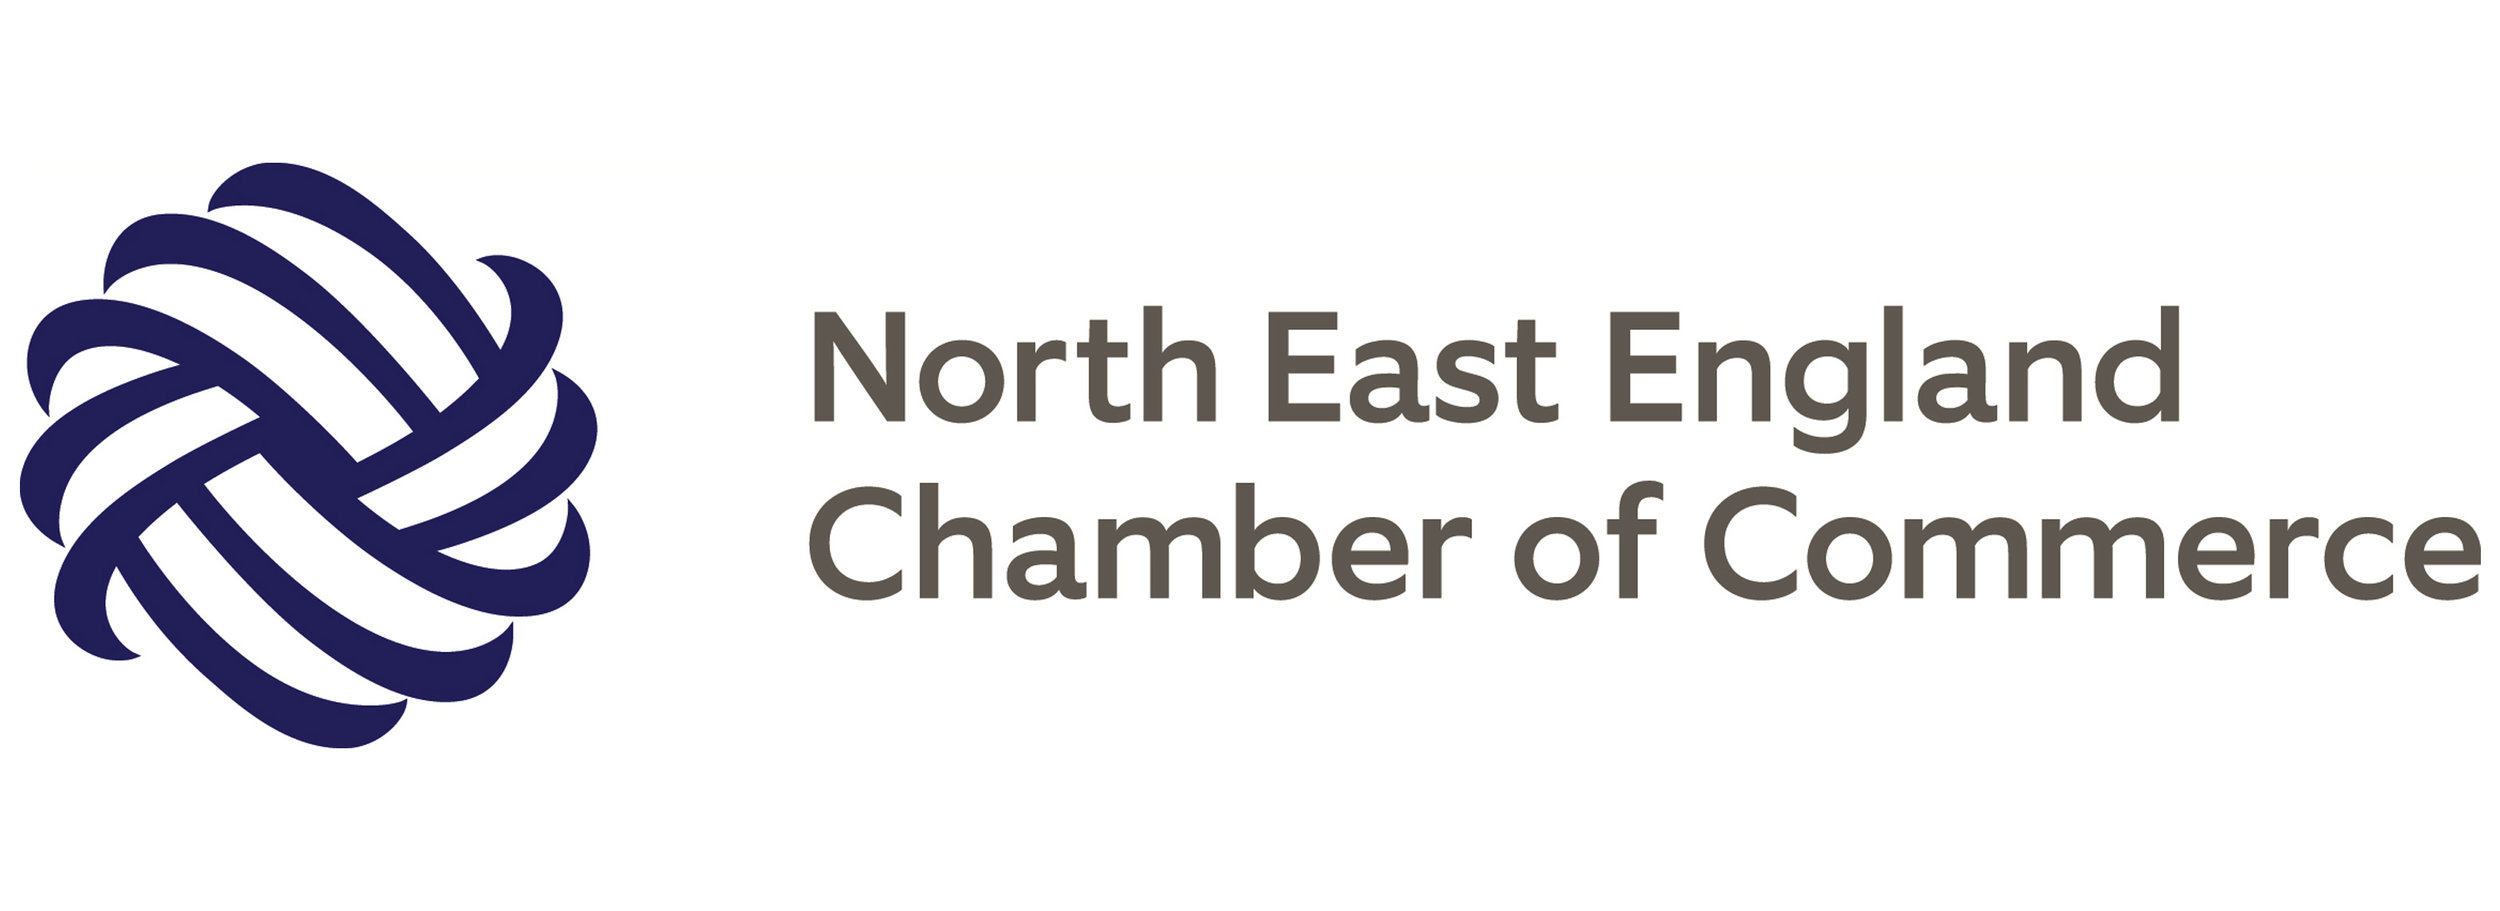 member-of-necc-logo-large-print-version.jpg